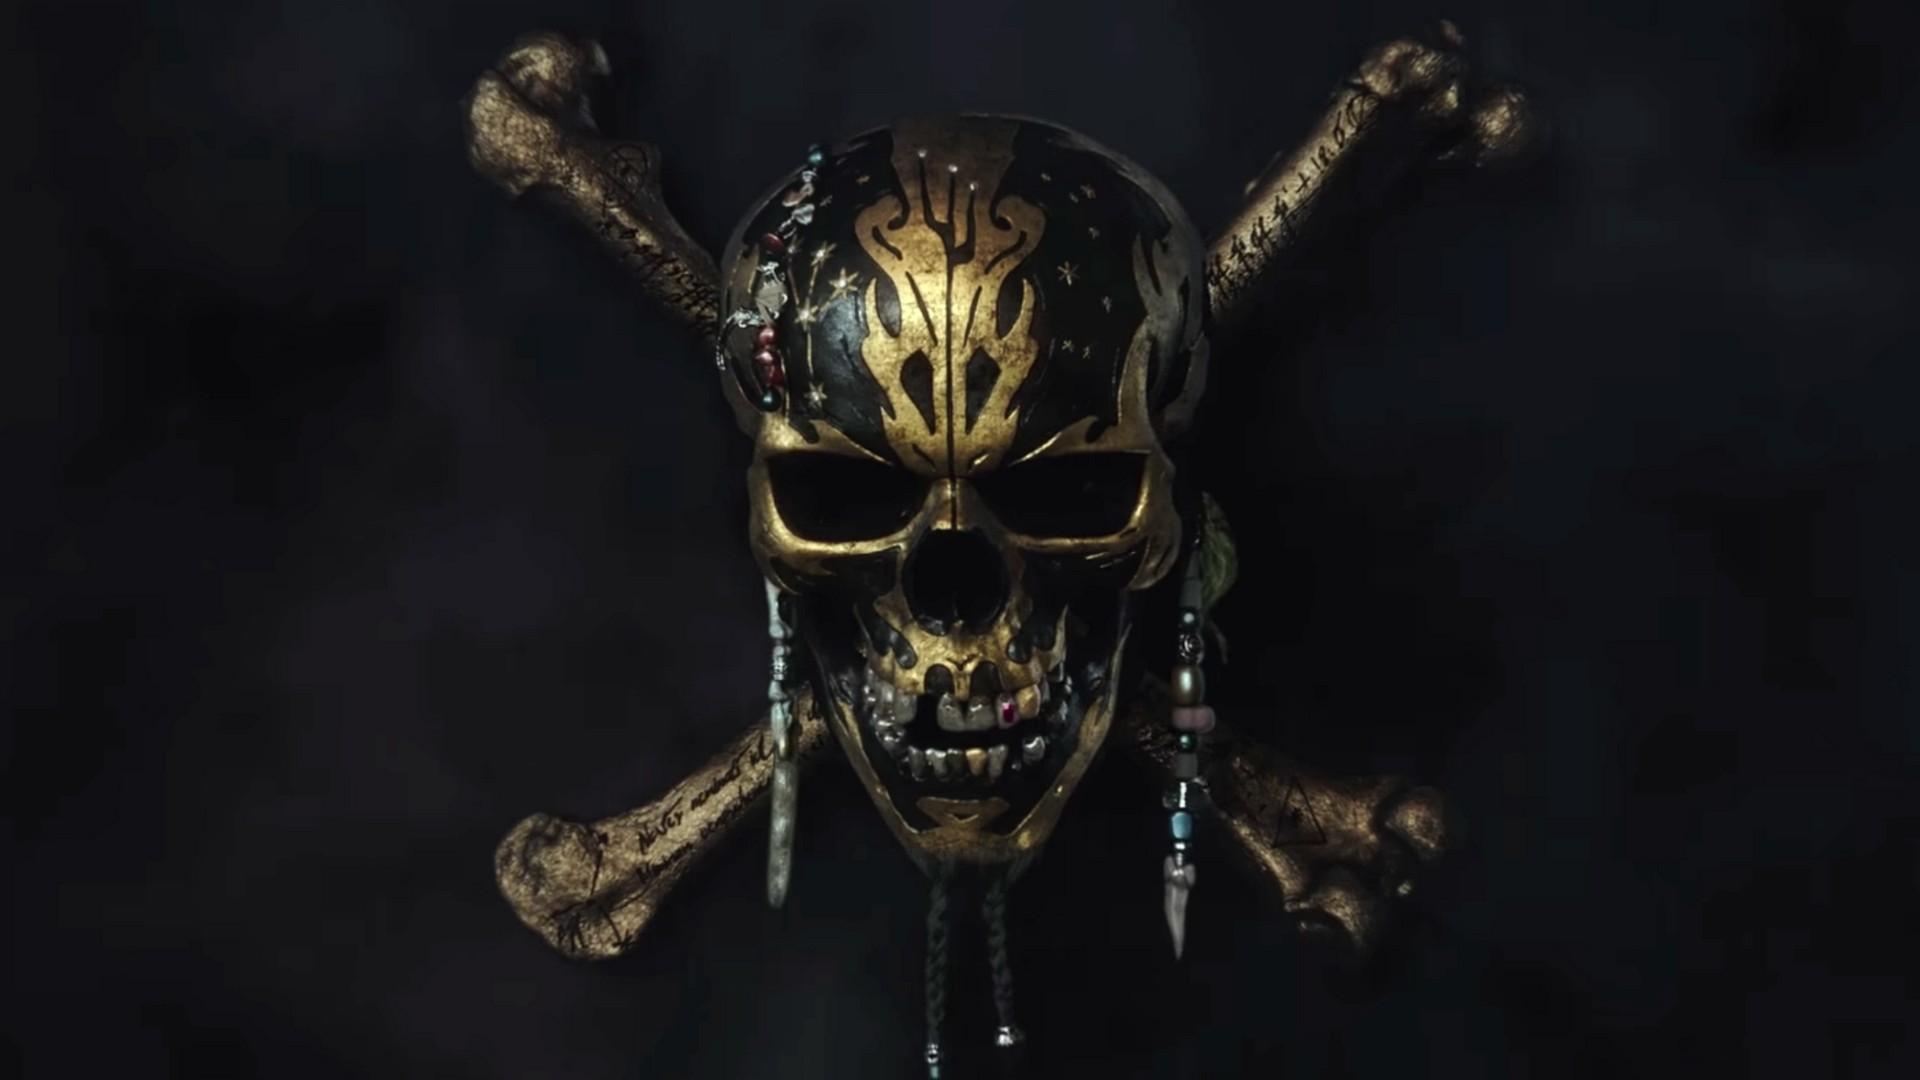 HD Pirates of the Caribbean: Dead Men Tell No Tales wallpaper